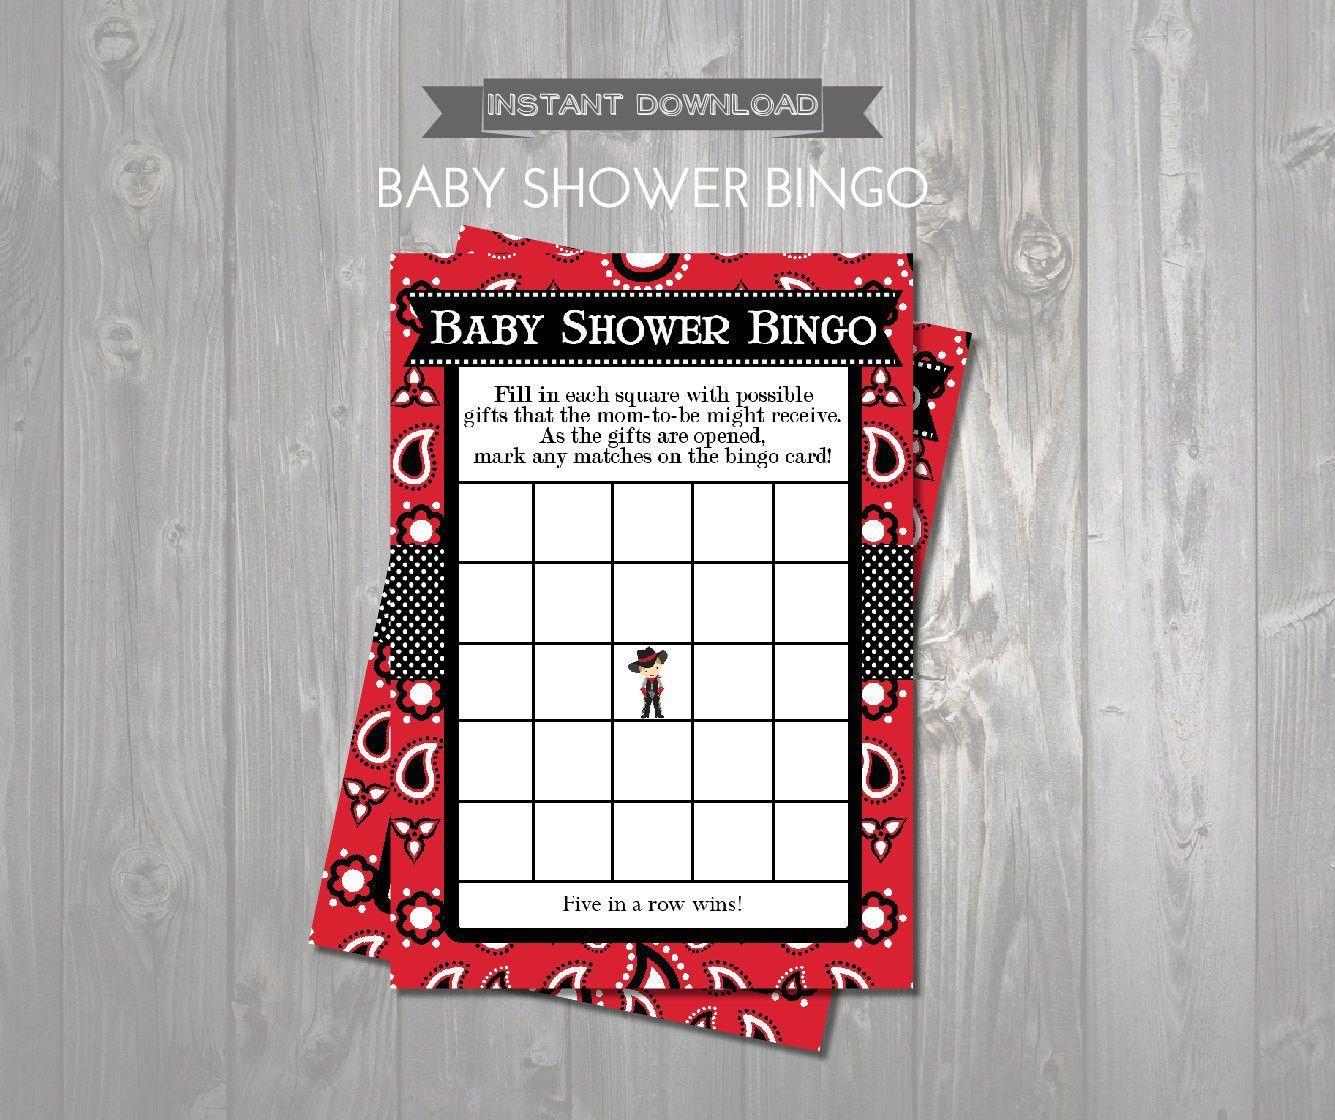 Baby Shower Bingo Game Cards - Printable Baby Shower Bingo